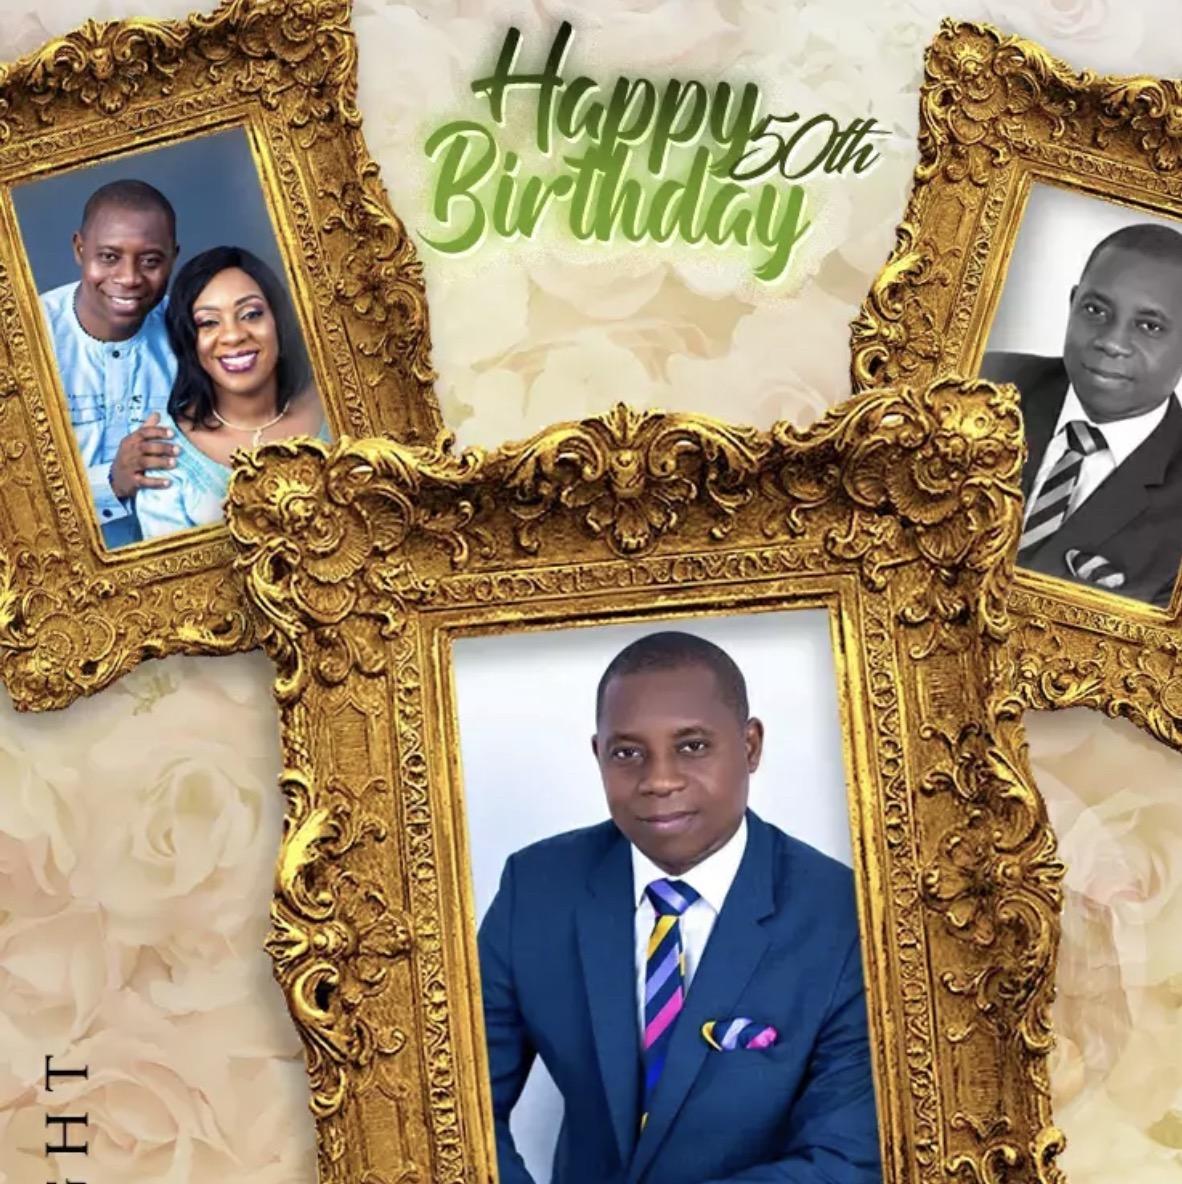 Happy Birthday Esteemed Pastor Gerorge